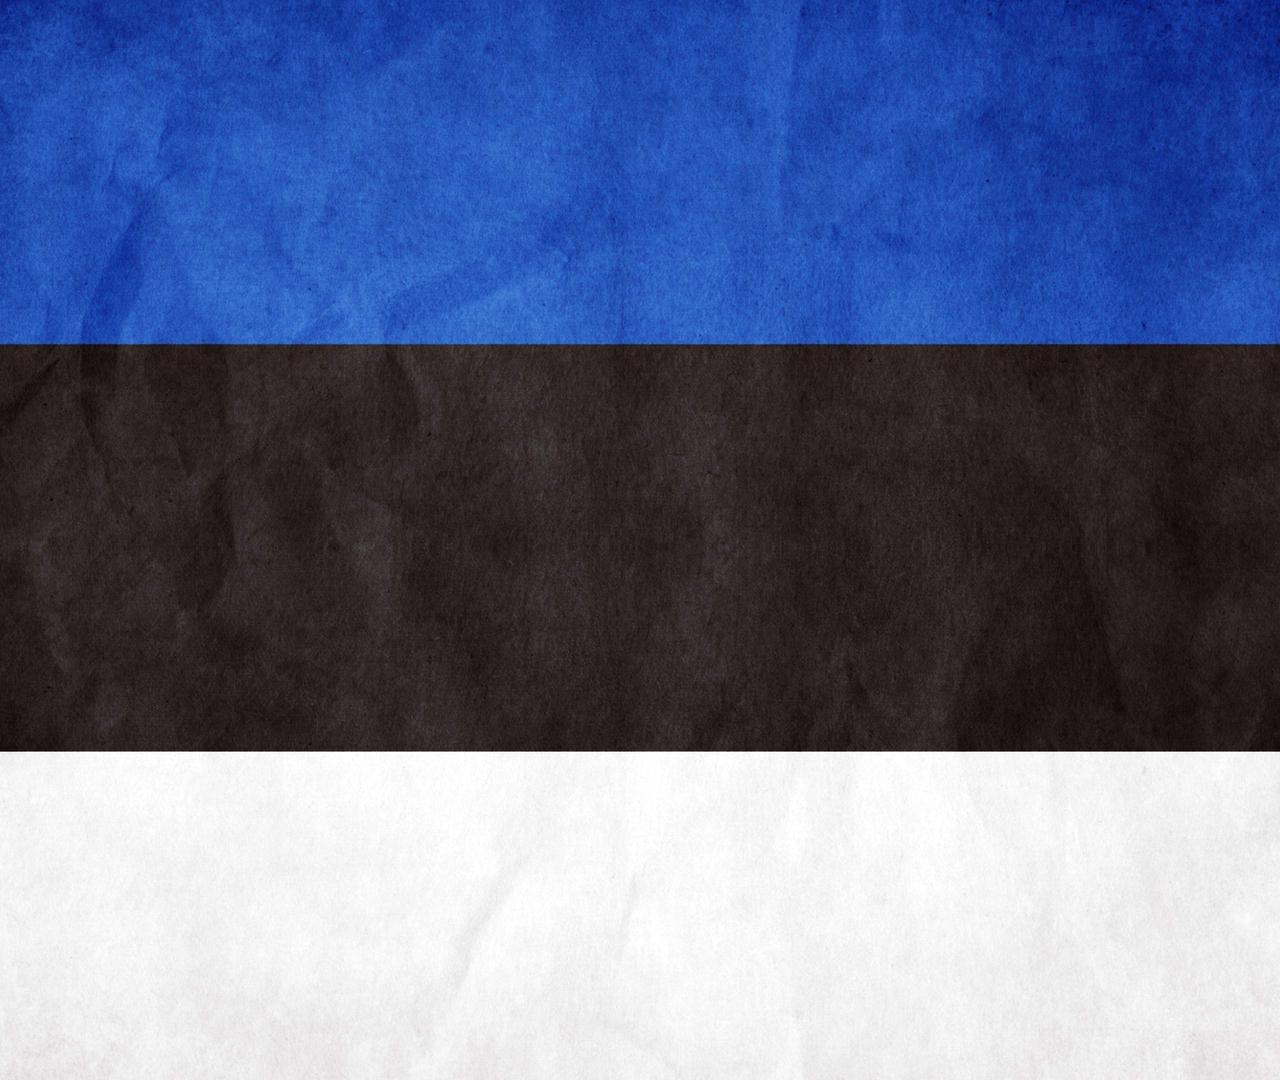 Estonia Countries Flag Artwork Wallpaper Gold Wallpapers 1280x1080